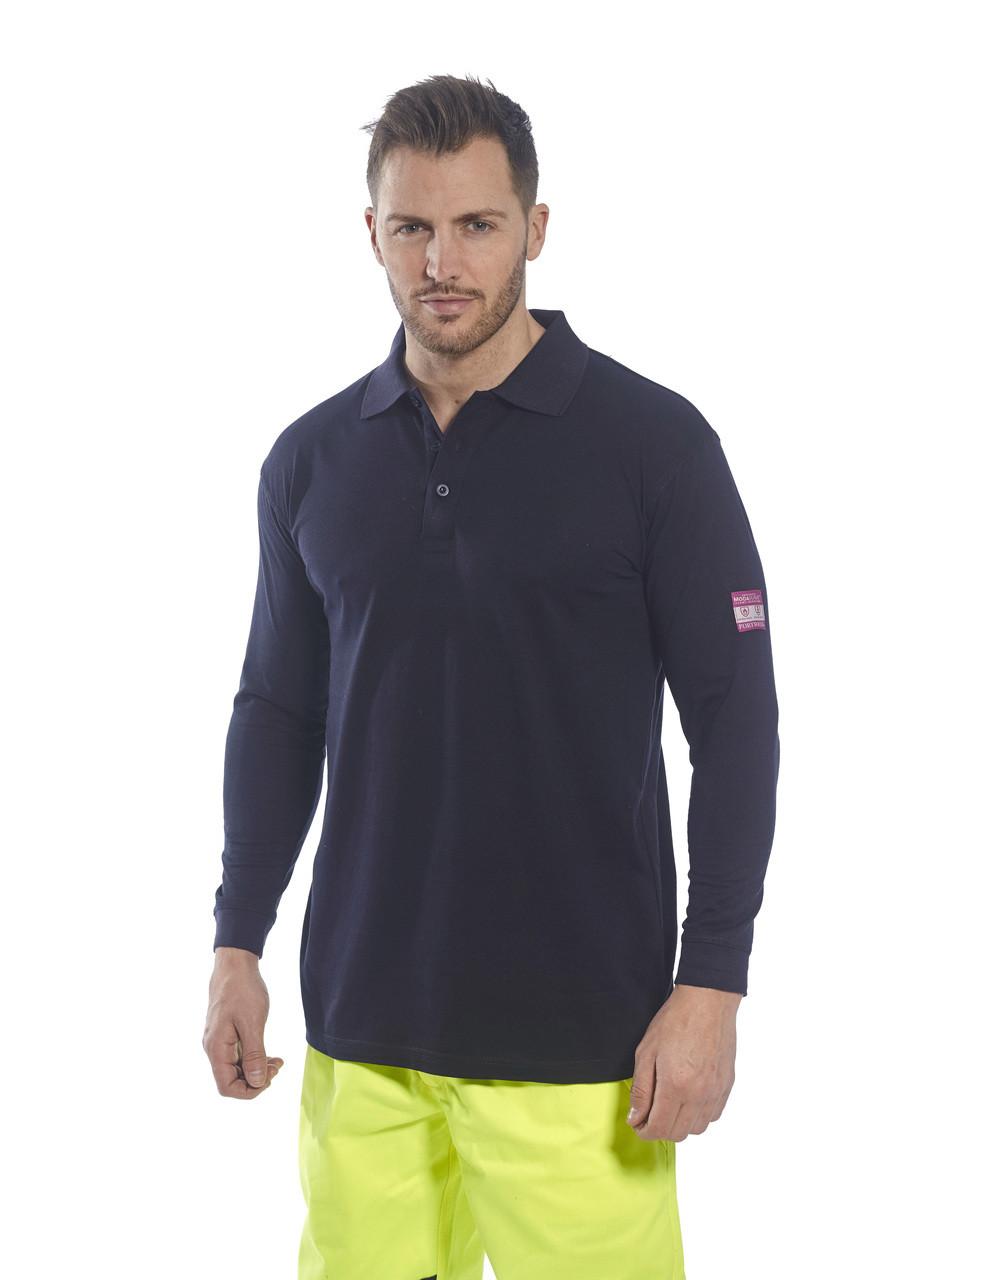 6f7103d55391c7 Flame Retardant Anti Static Long Sleeve Polo Shirt FR10 - Direct ...